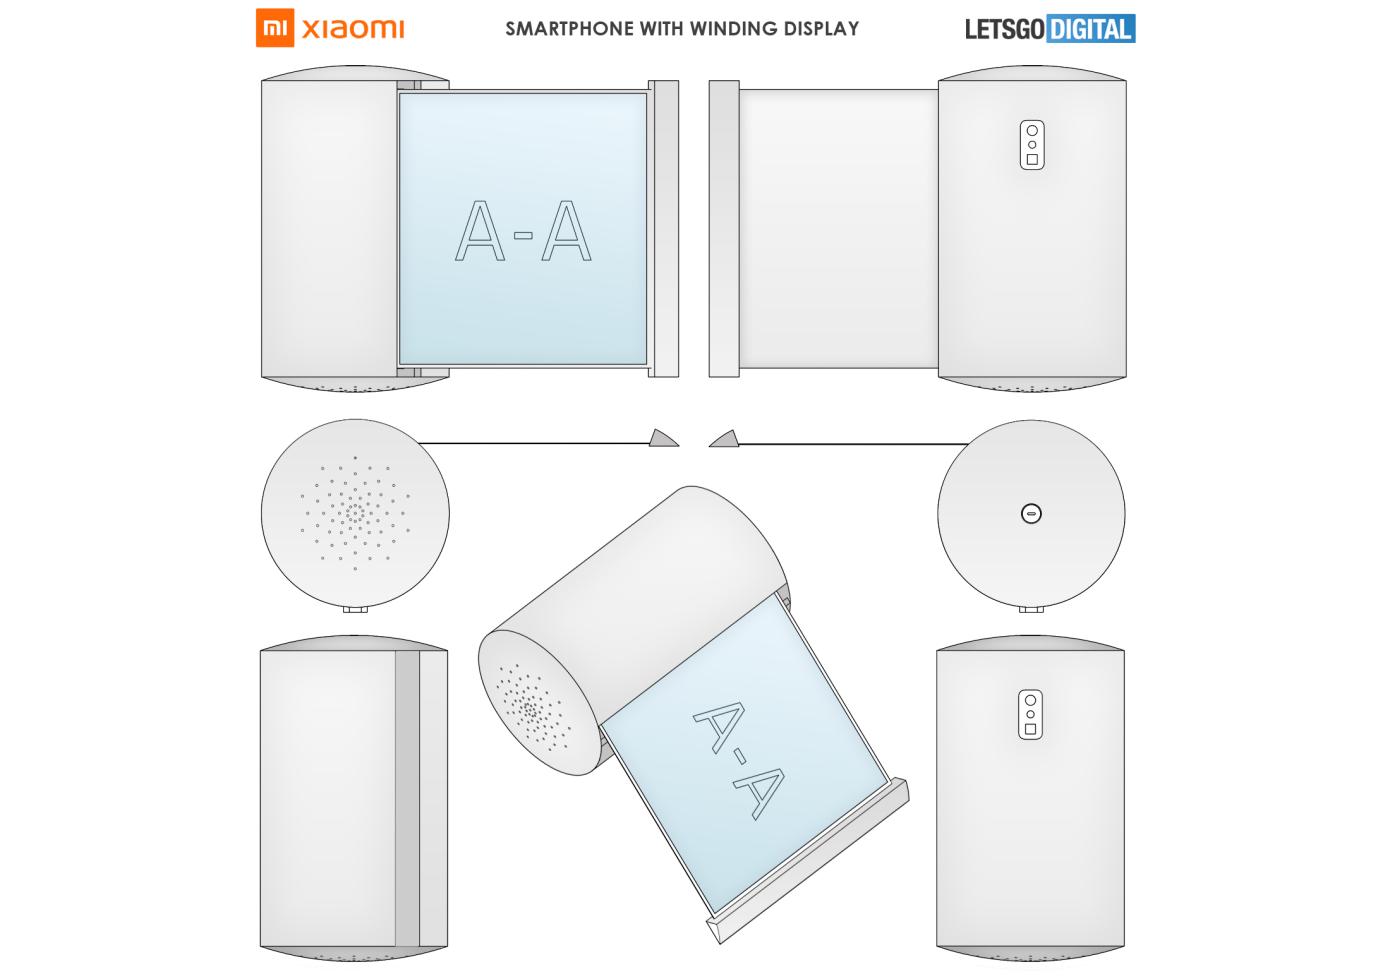 Smartfon Ruletka Xiaomi Patentuet Novoe Primenenie Gibkogo Displeya 1